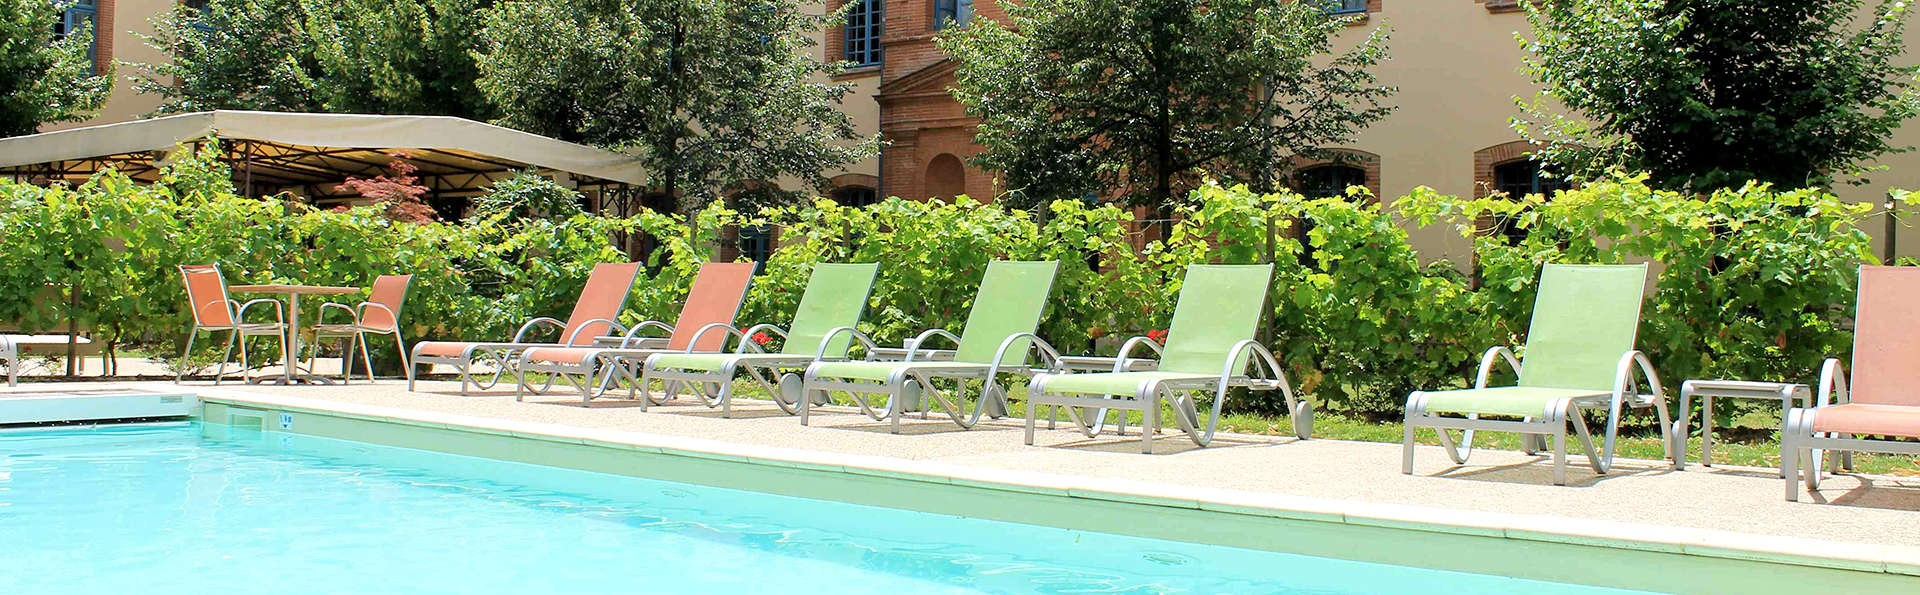 Abbaye des Capucins Hôtel Spa & Resort BW Premier Collection - Edit_Pool.jpg